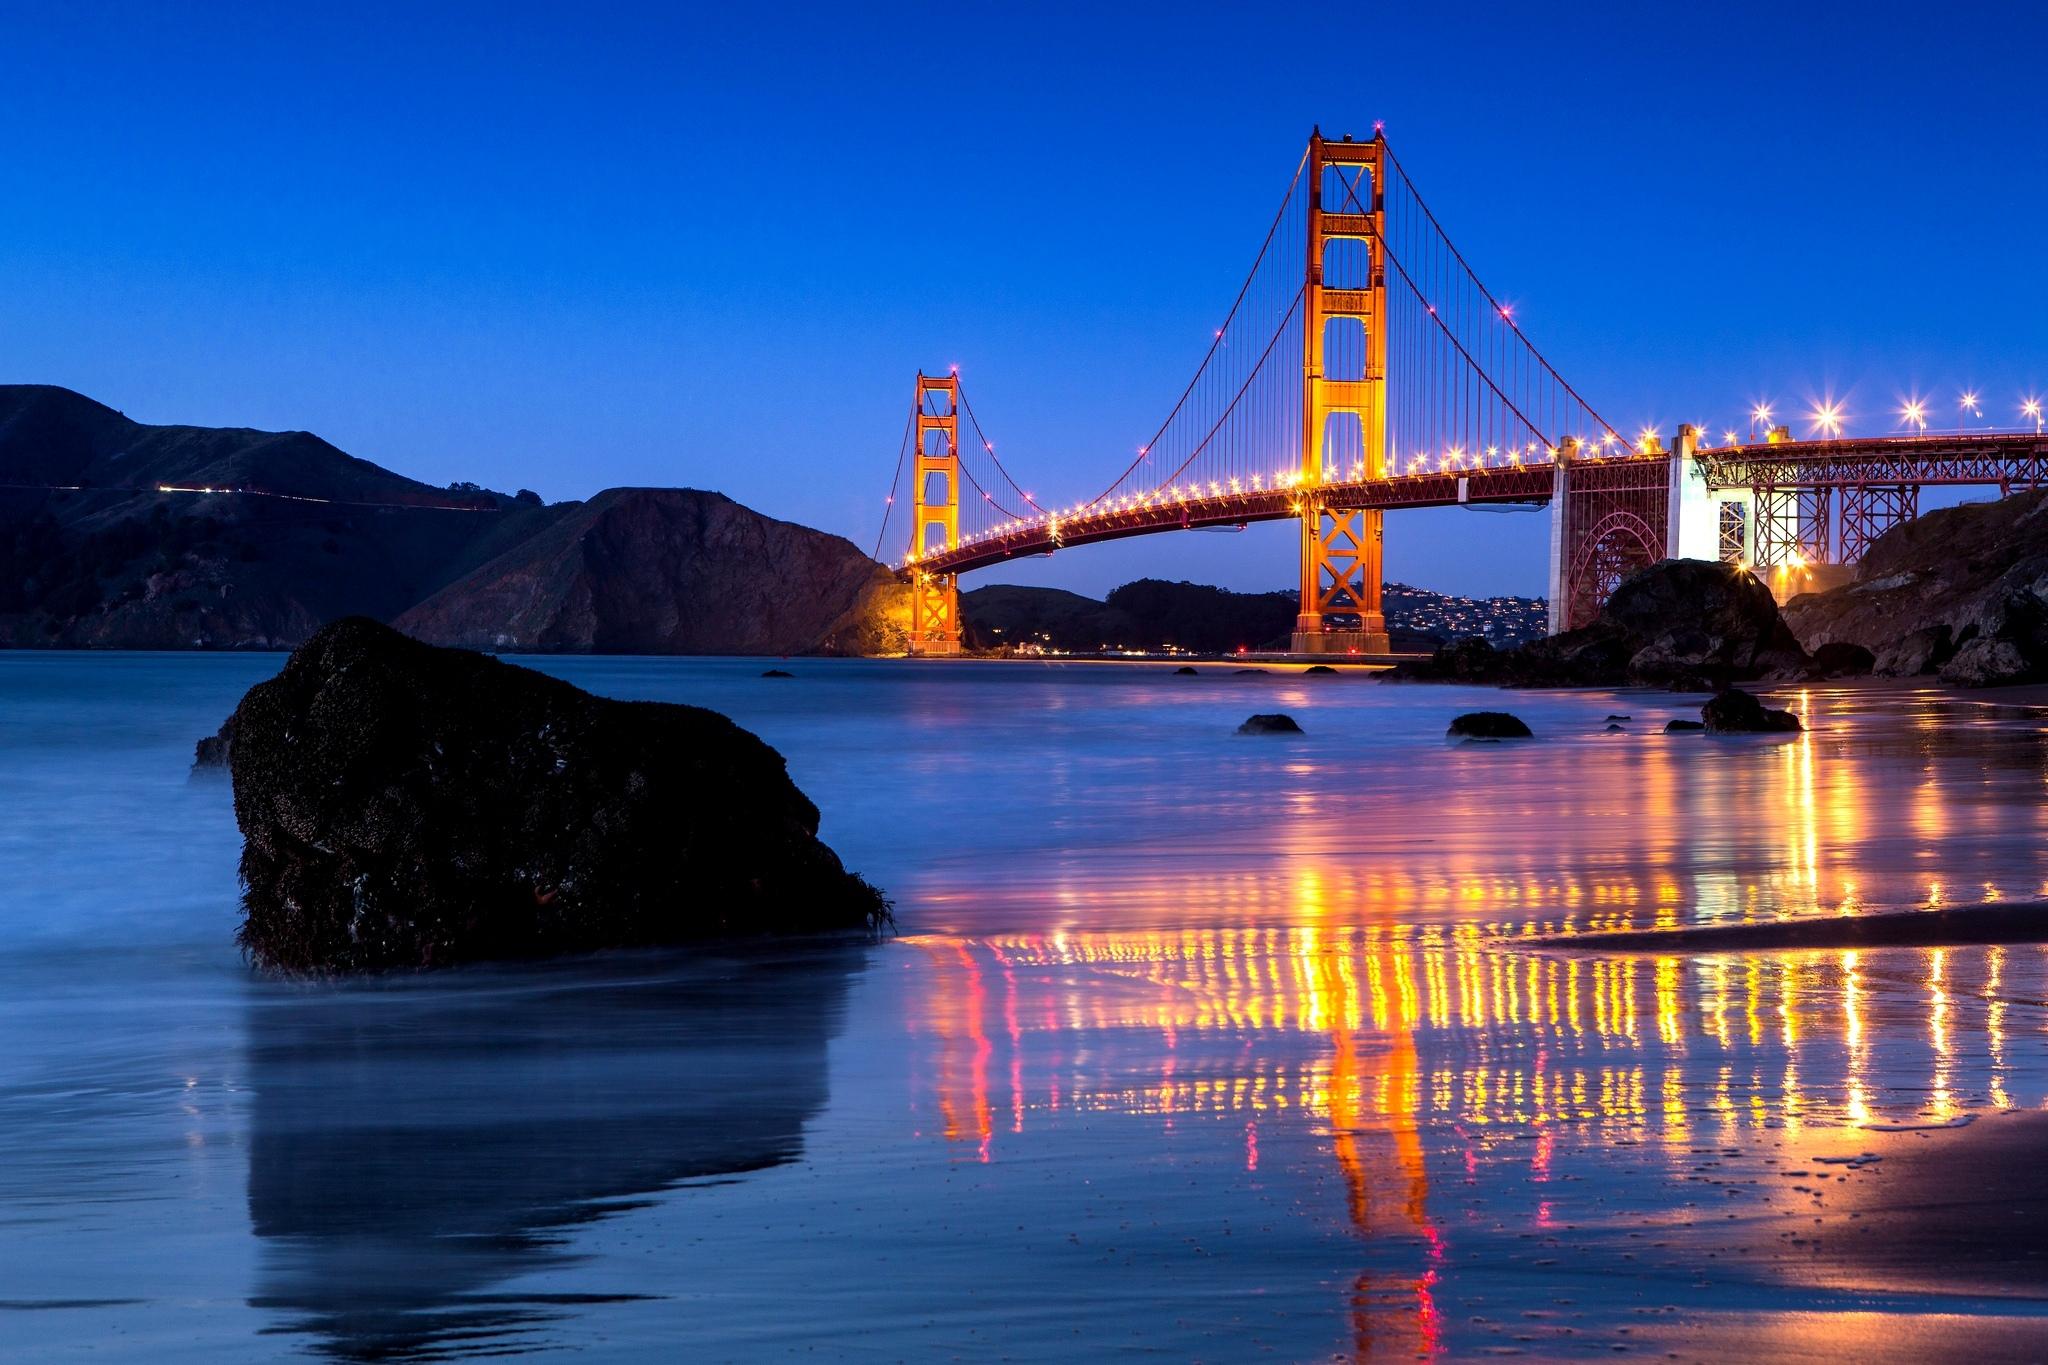 Usa Bridge Golden Gate Bridge San Francisco Reflection Wallpaper 2048x1365 220462 Wallpaperup